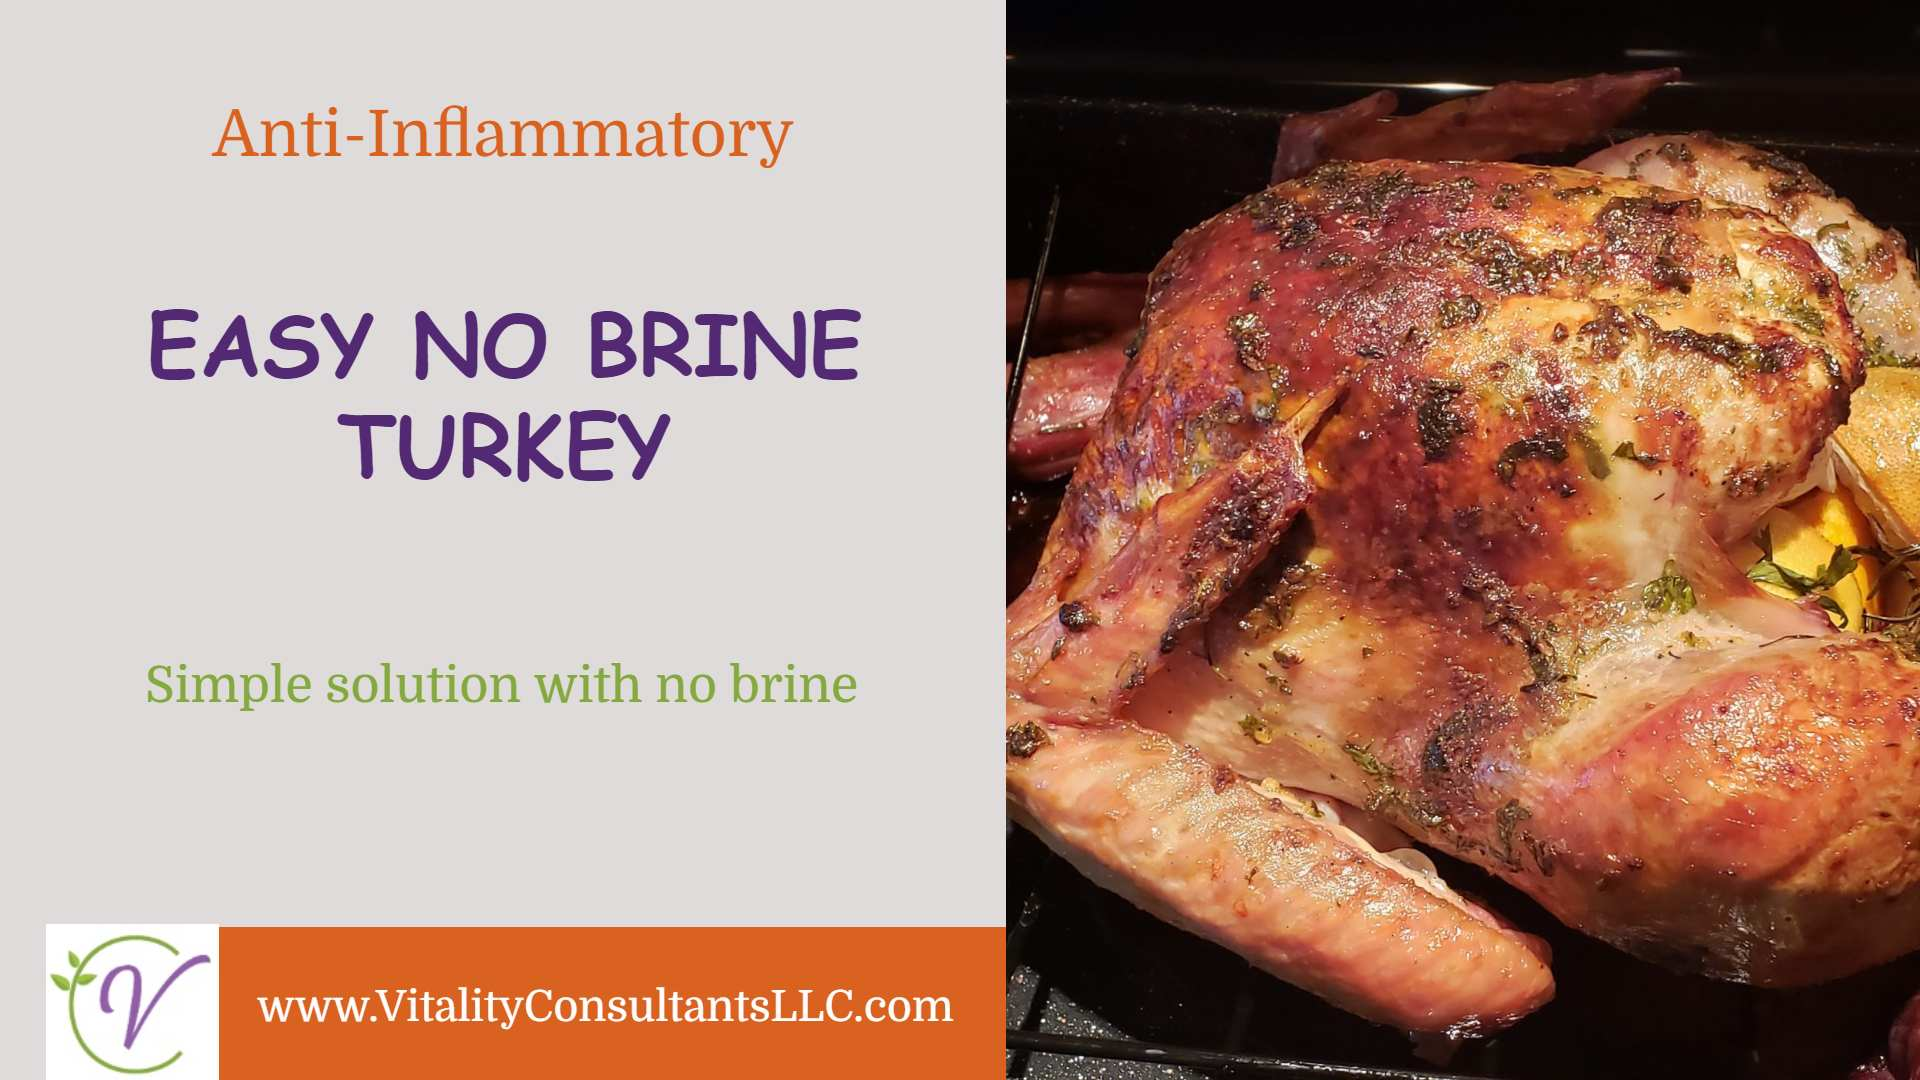 Easy No Brine Turkey